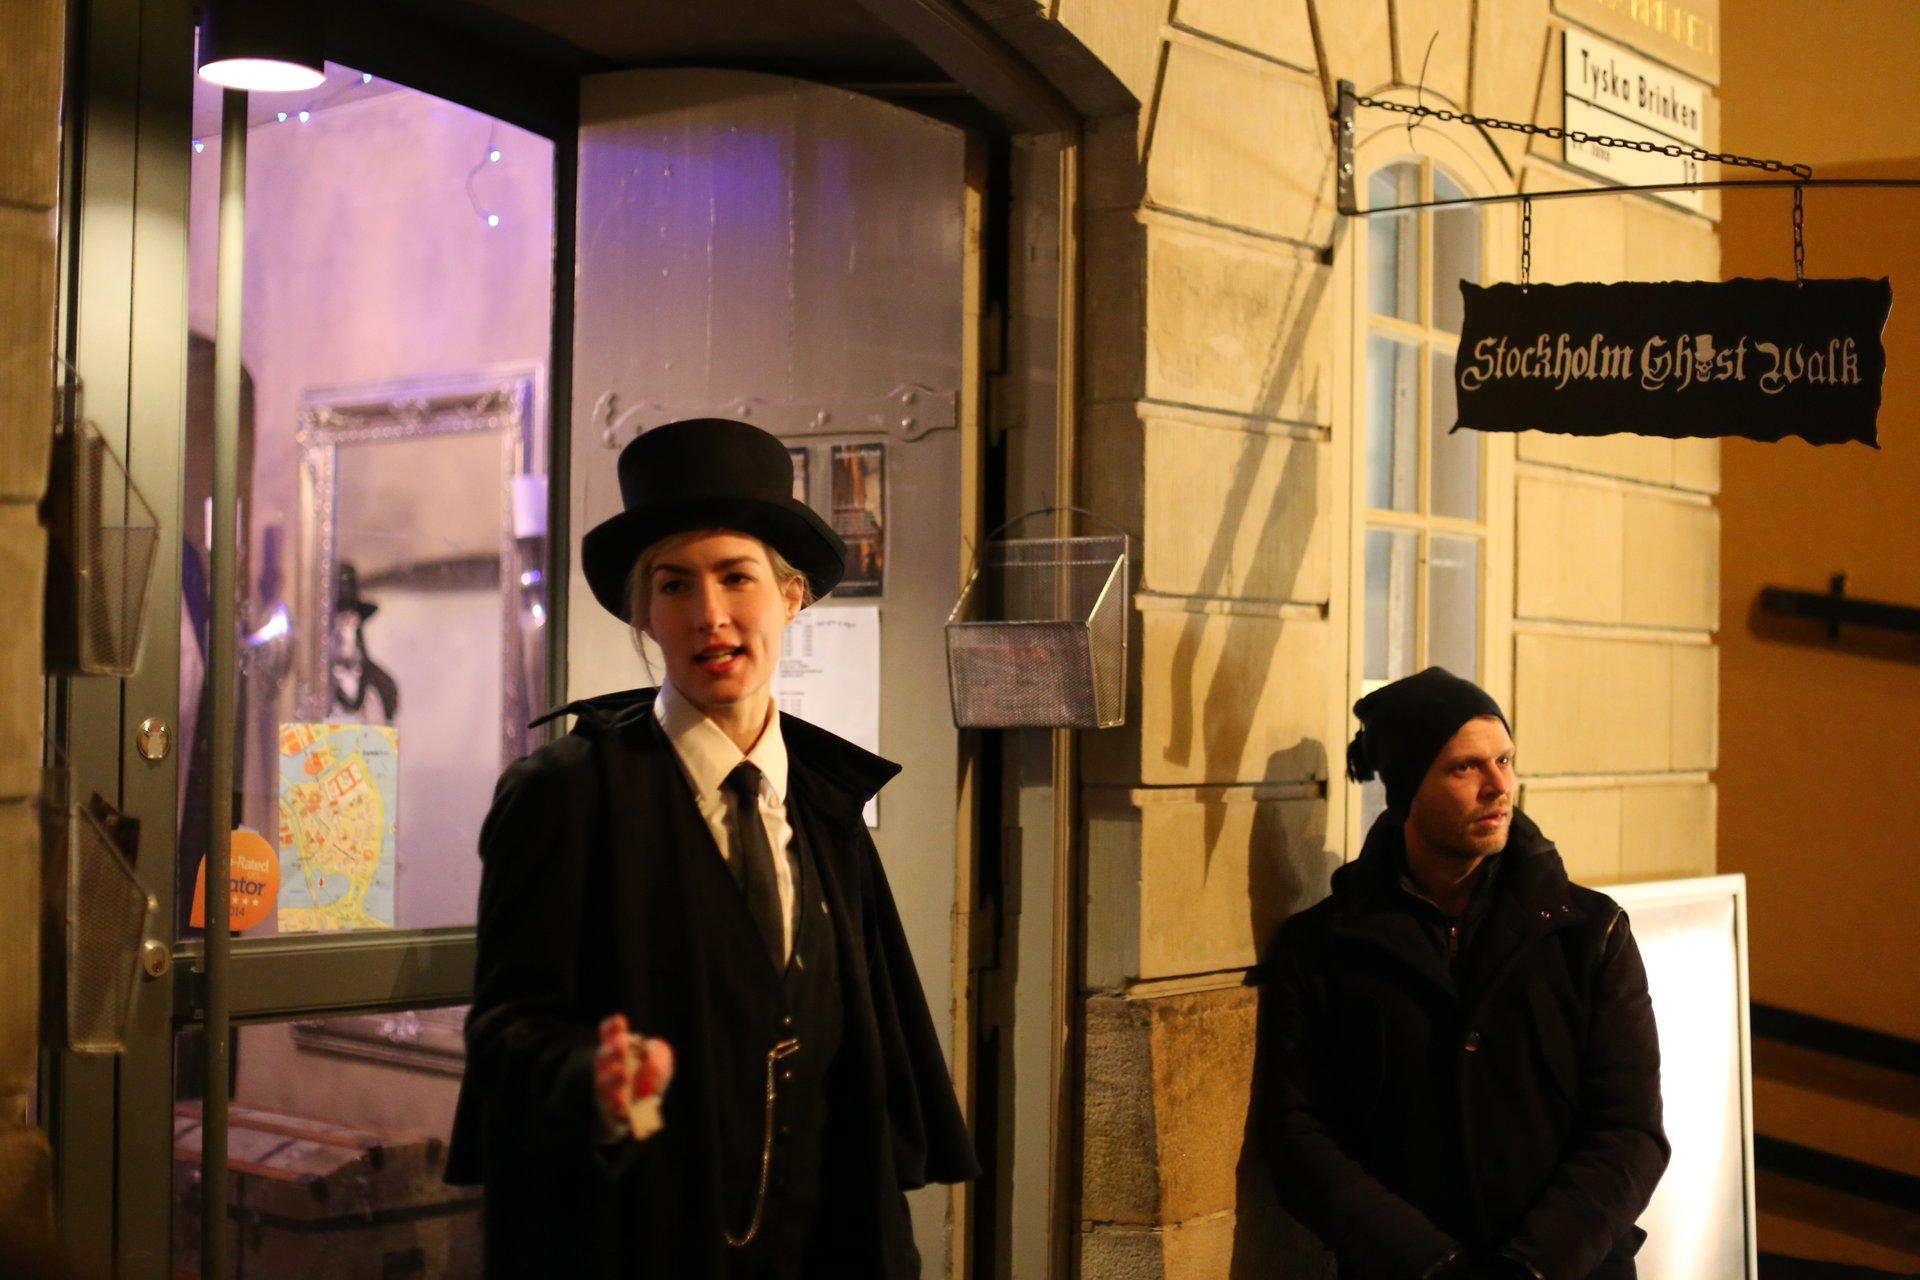 Stockholm ghost walk 2020